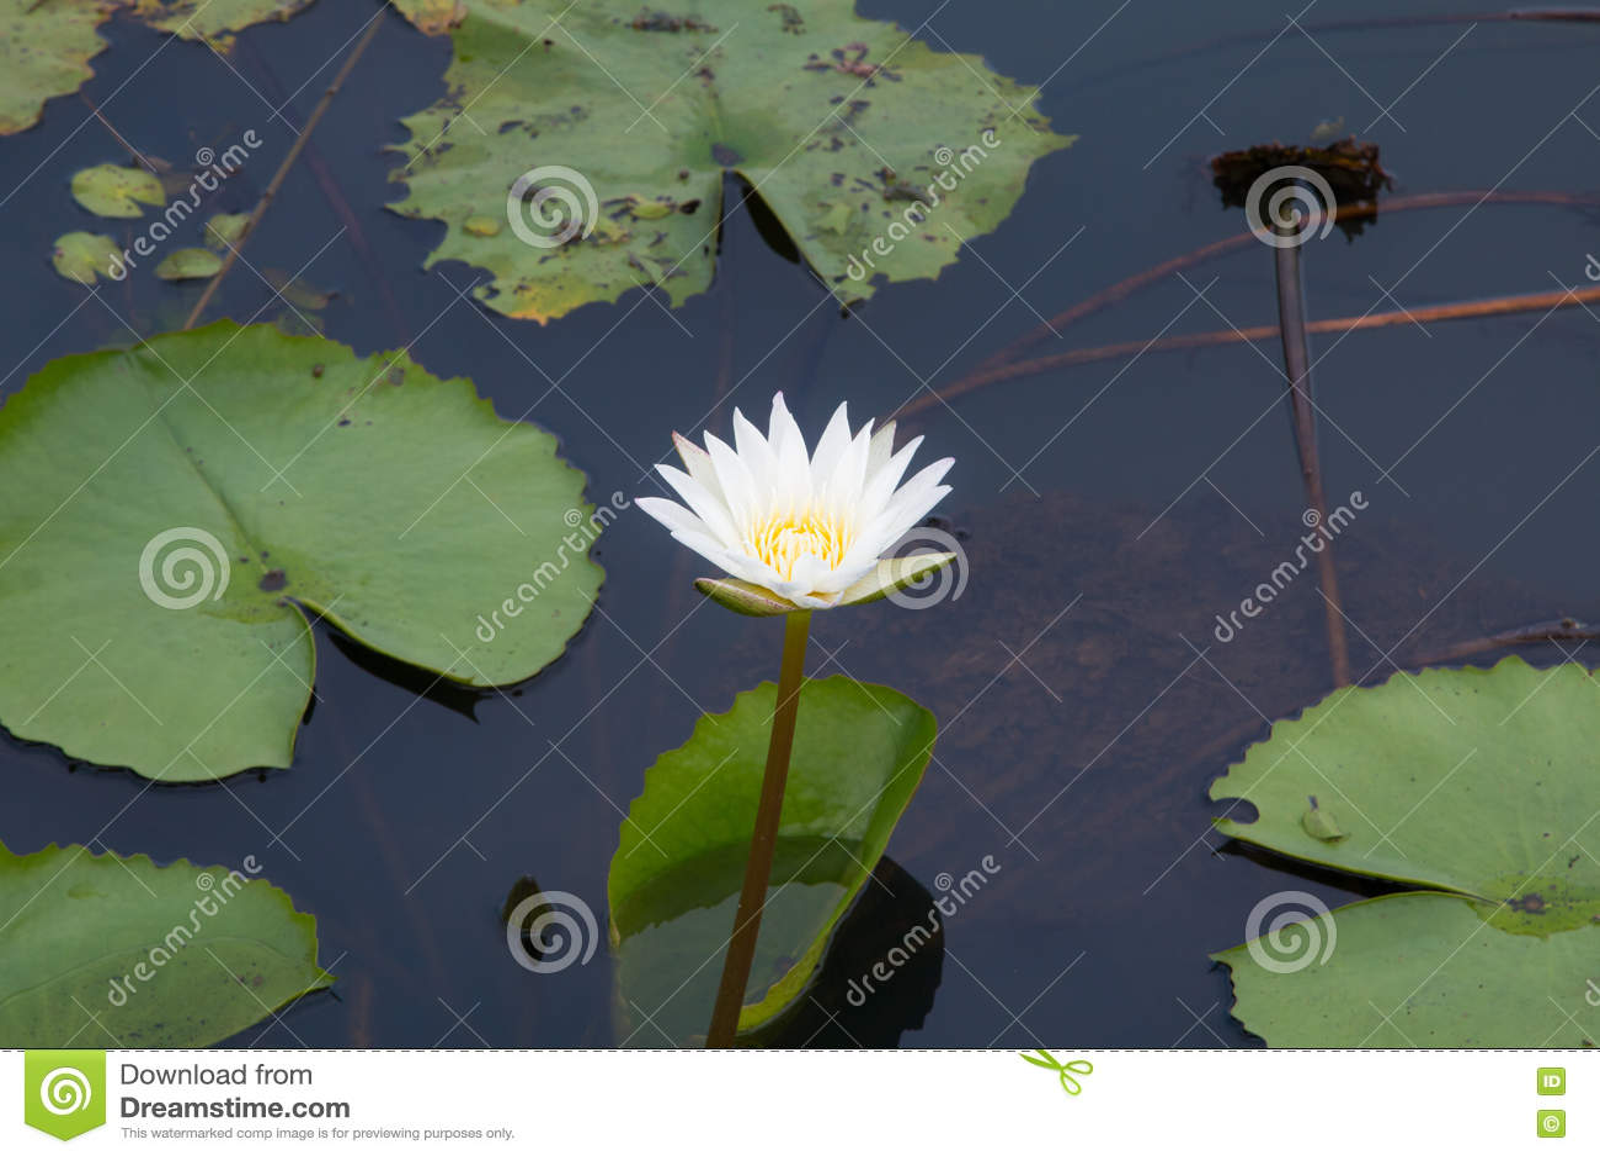 Lotus Flower In Pond Stock Illustration Illustration Of Plant